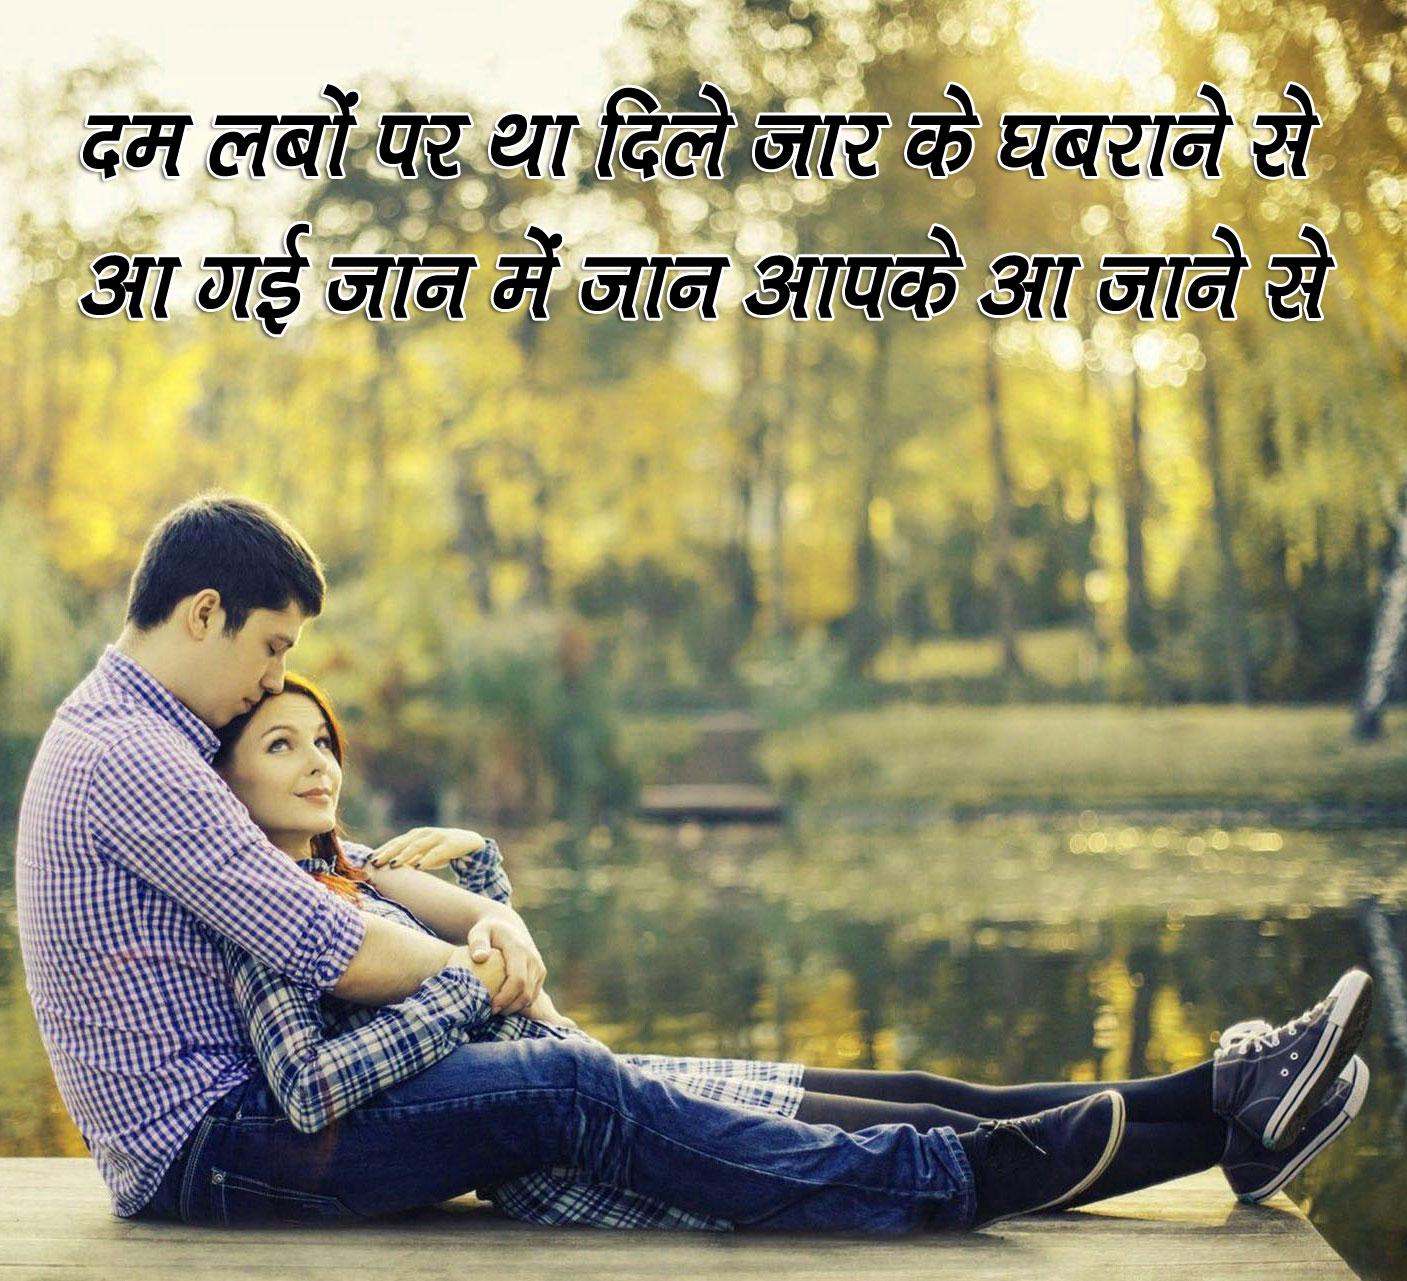 Best Hindi Shayari Images 43